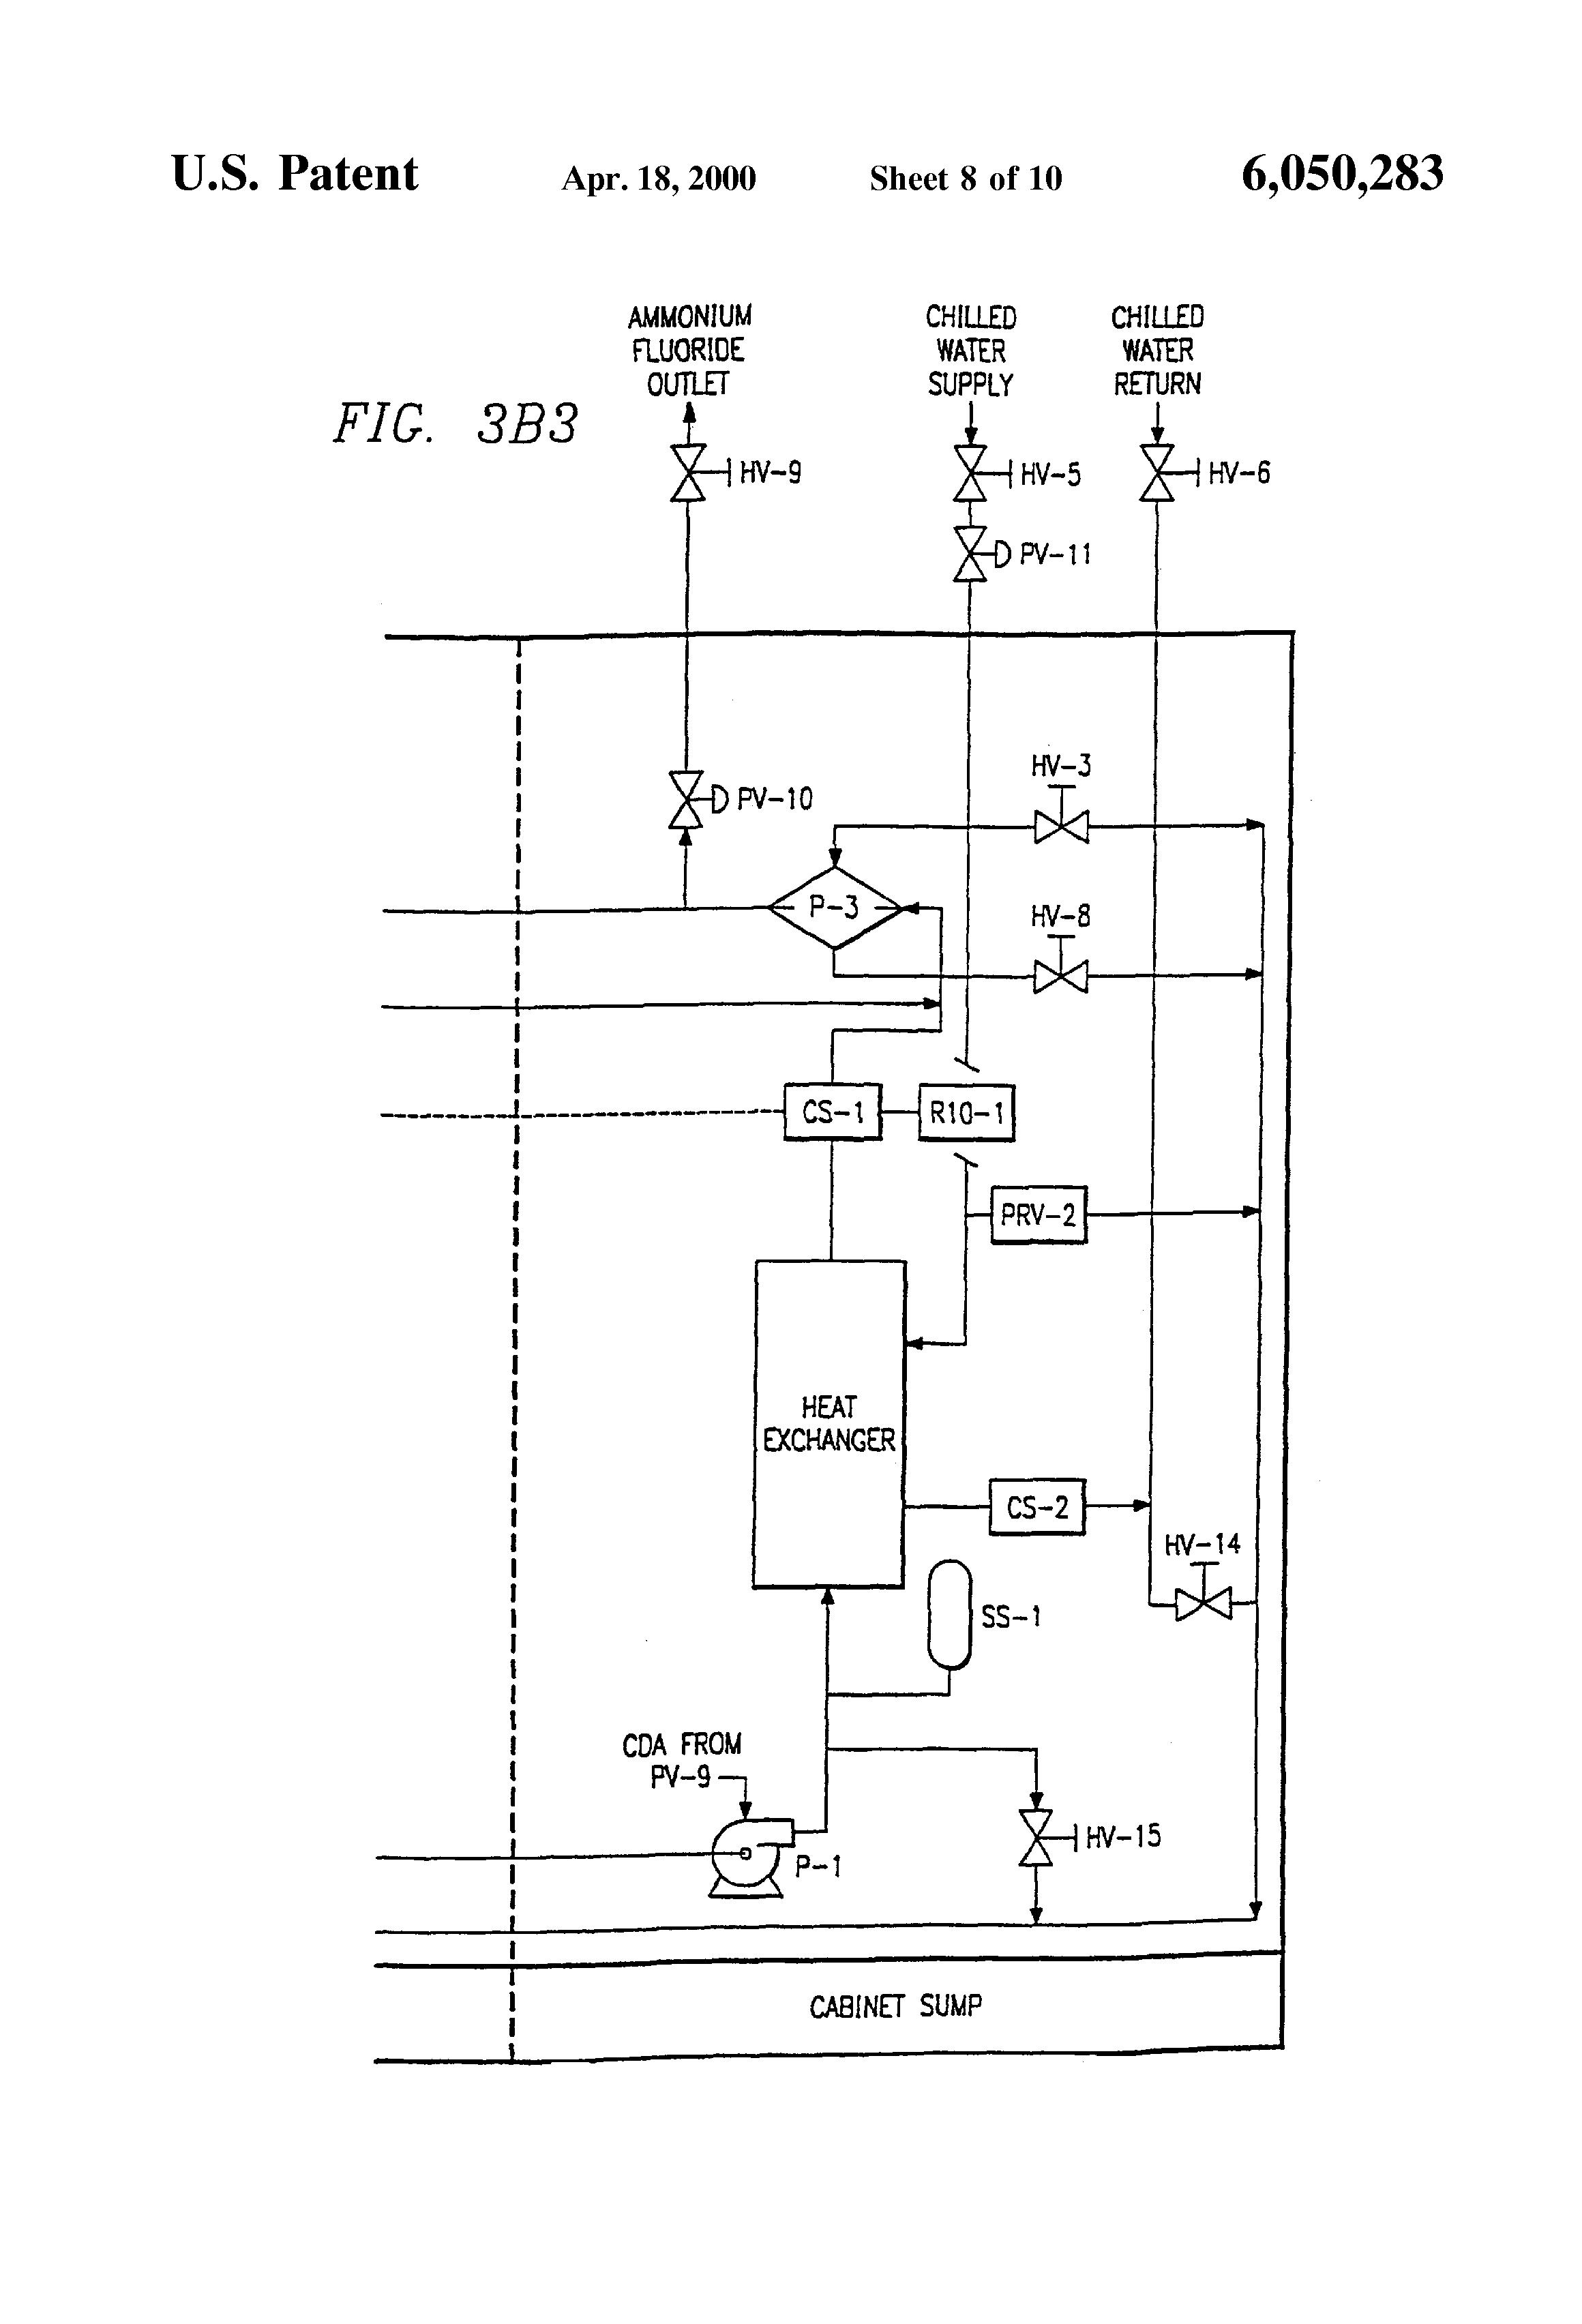 marlin process control solution manual